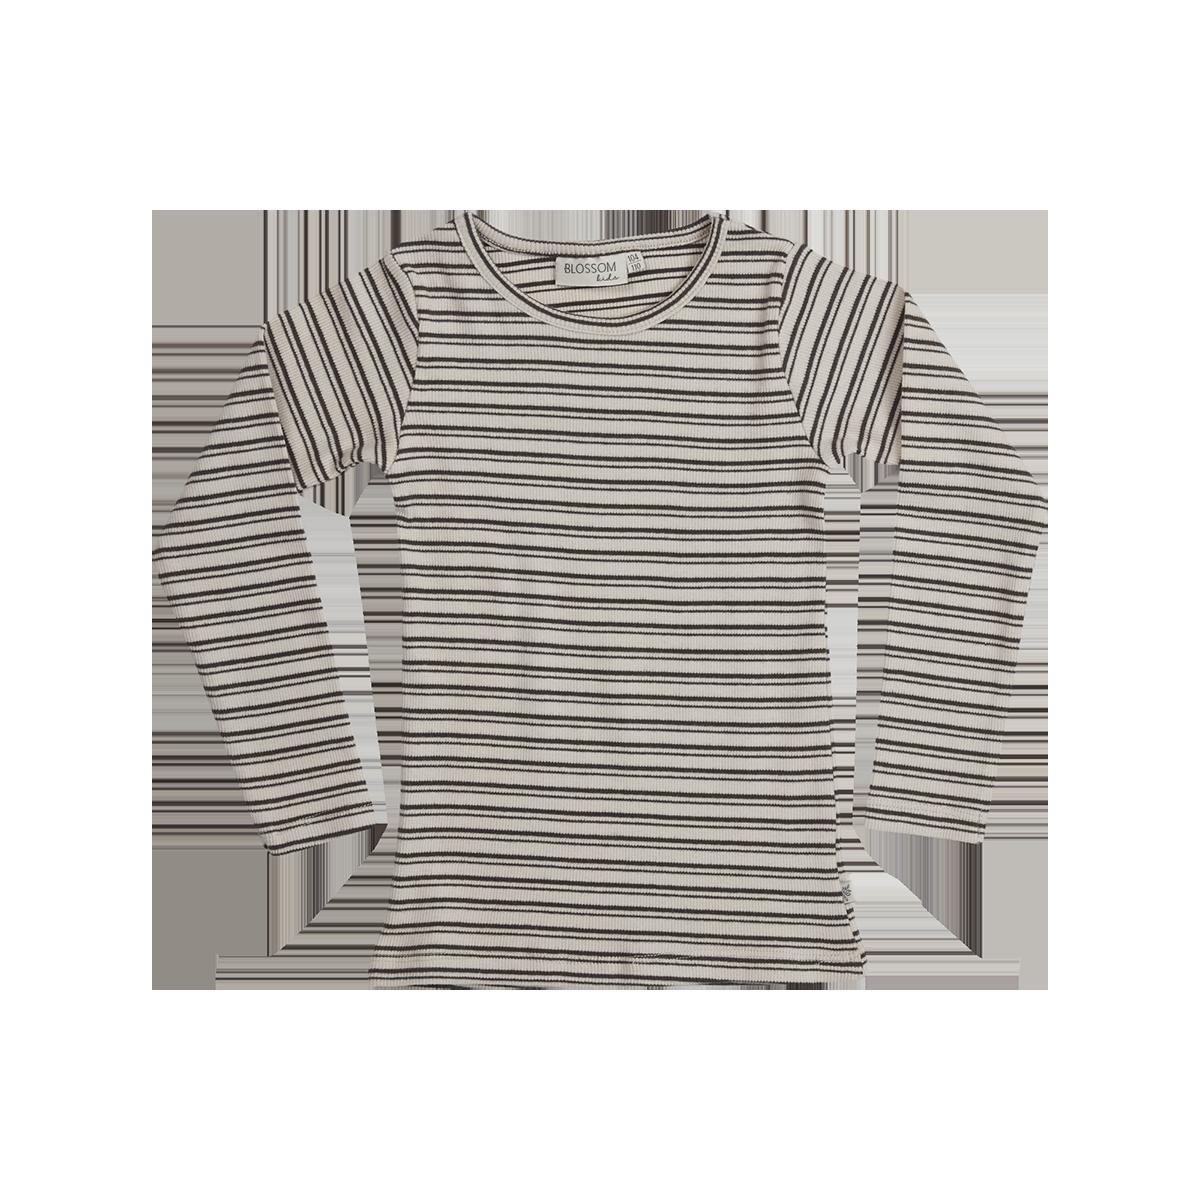 Blossom Kids Long sleeve - stripes - Cinnamon-1